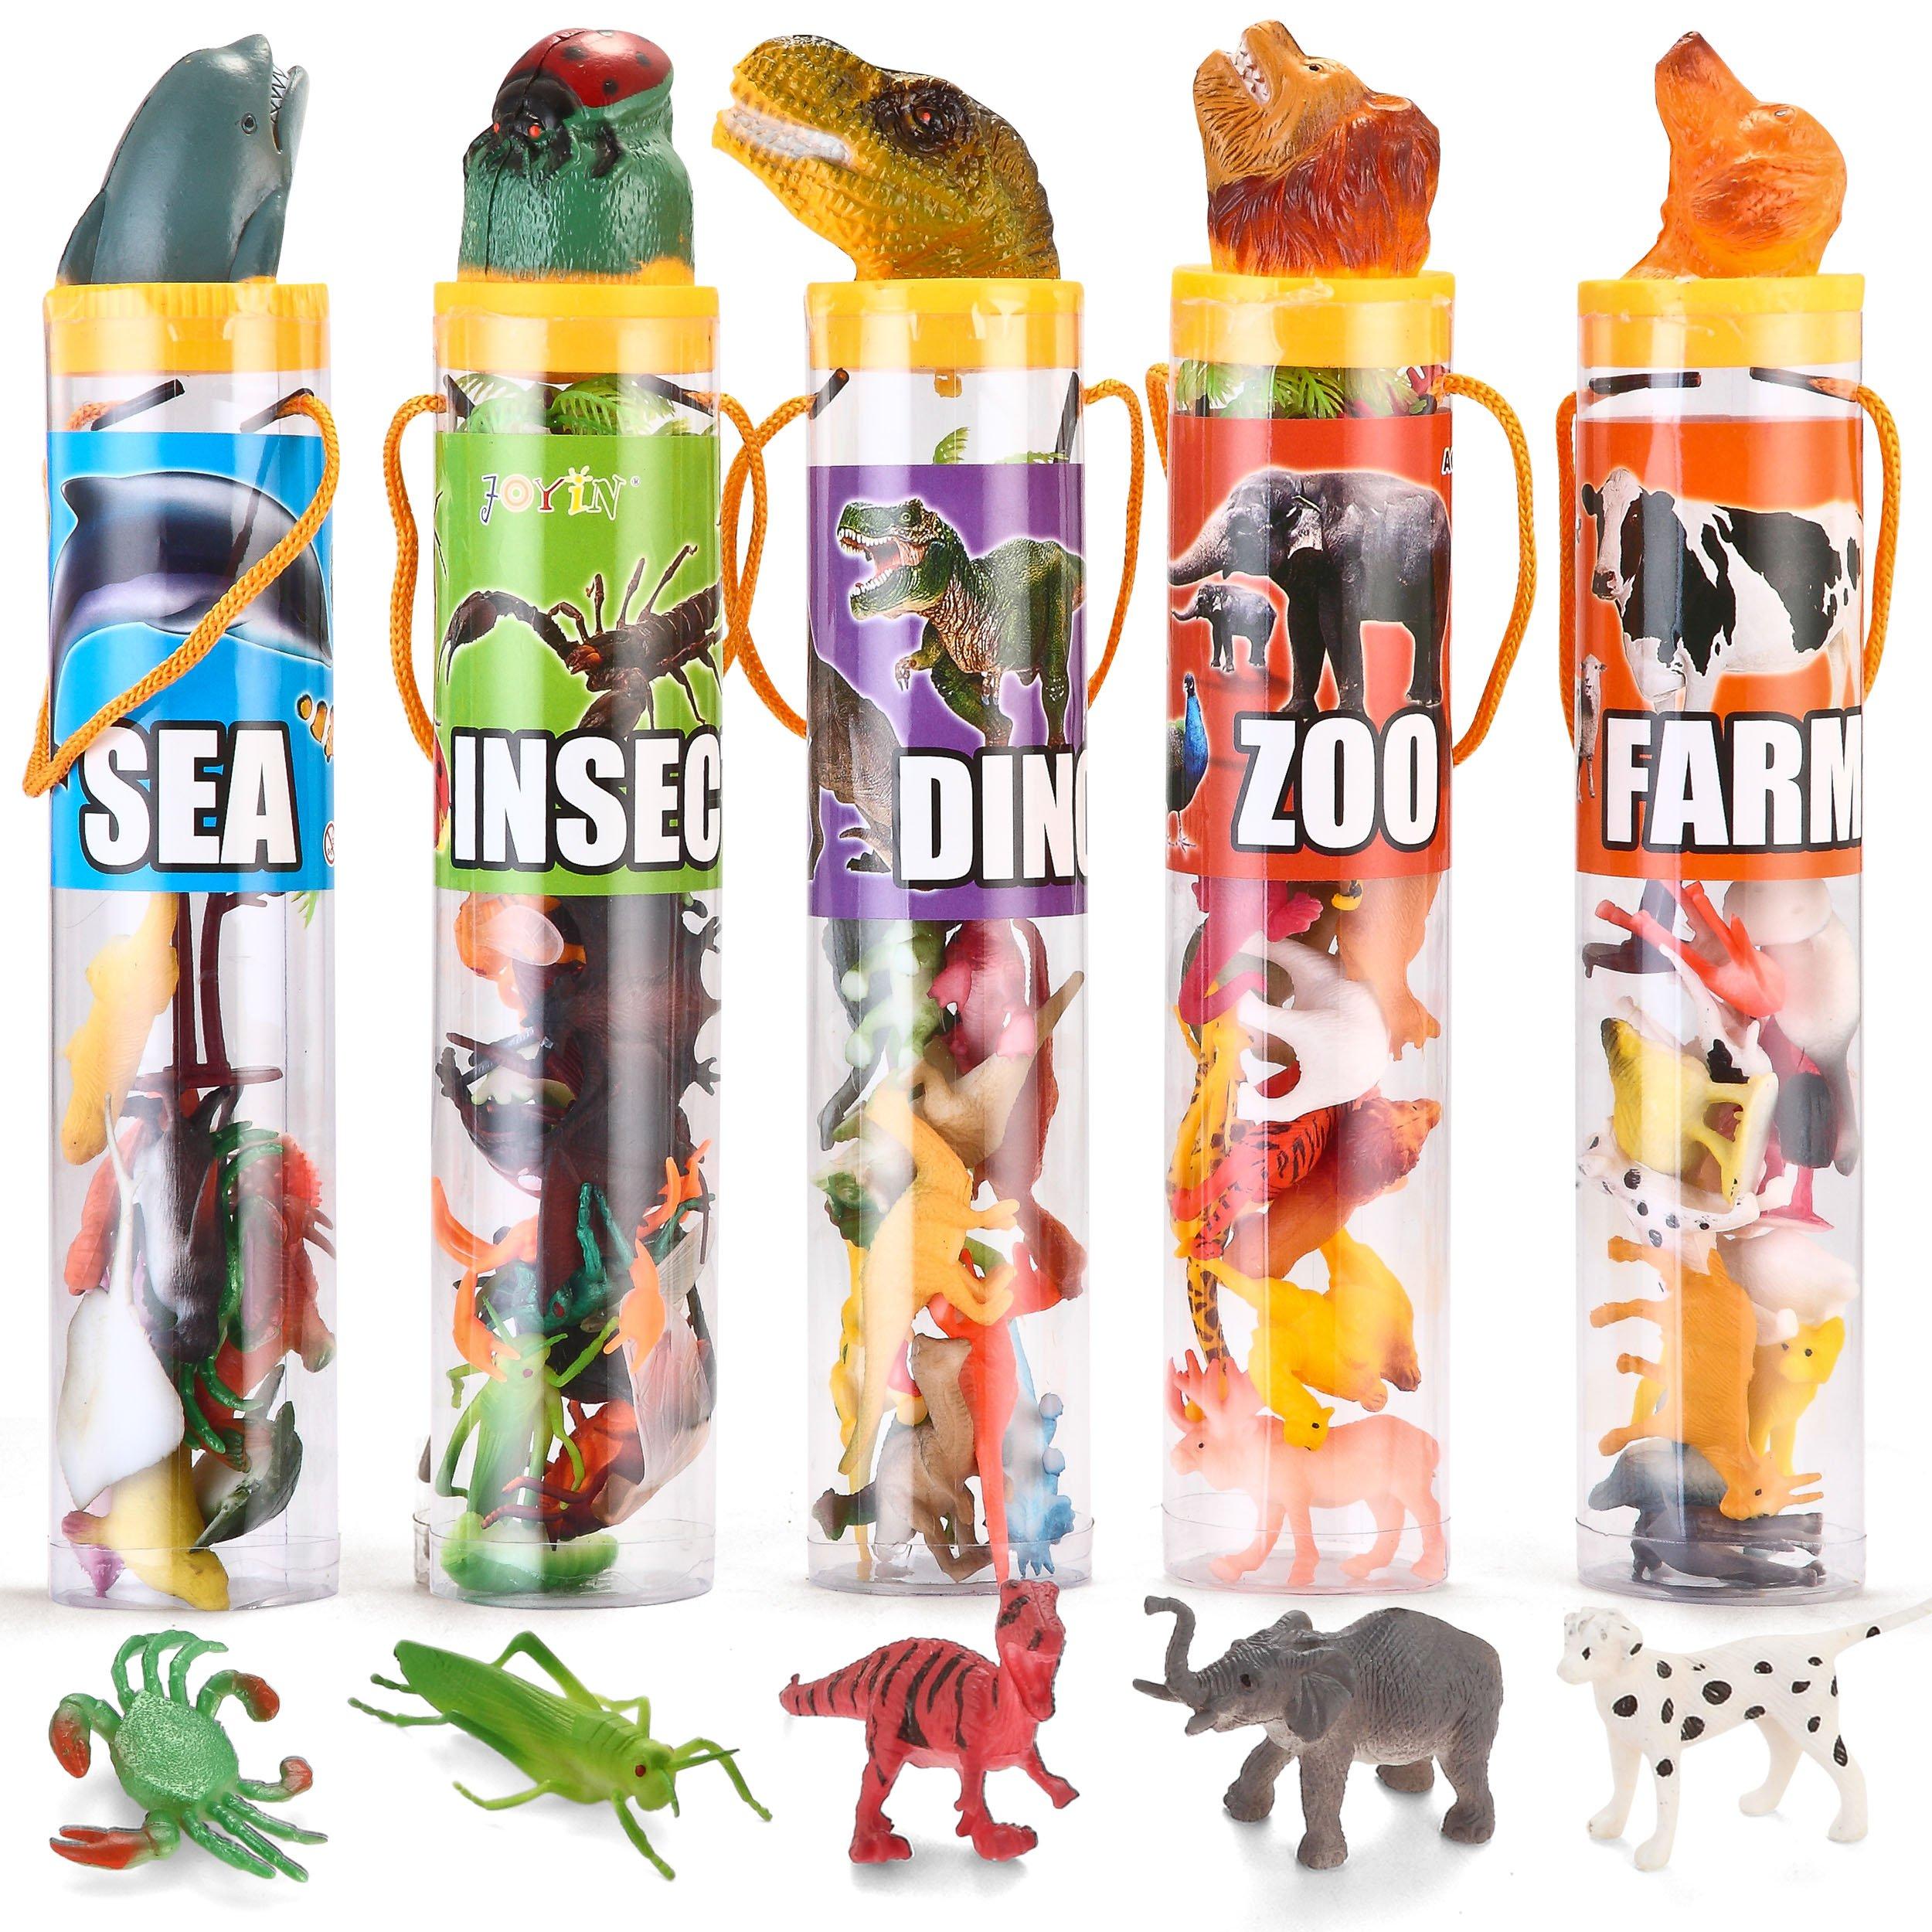 Joyin Toy 69 Pieces Natural World Animal Dinosaur Insect Sea Animal Farm Animal Figures Easter Basket Stuffer Mini Plastic Vinyl Assorted Figures Playset